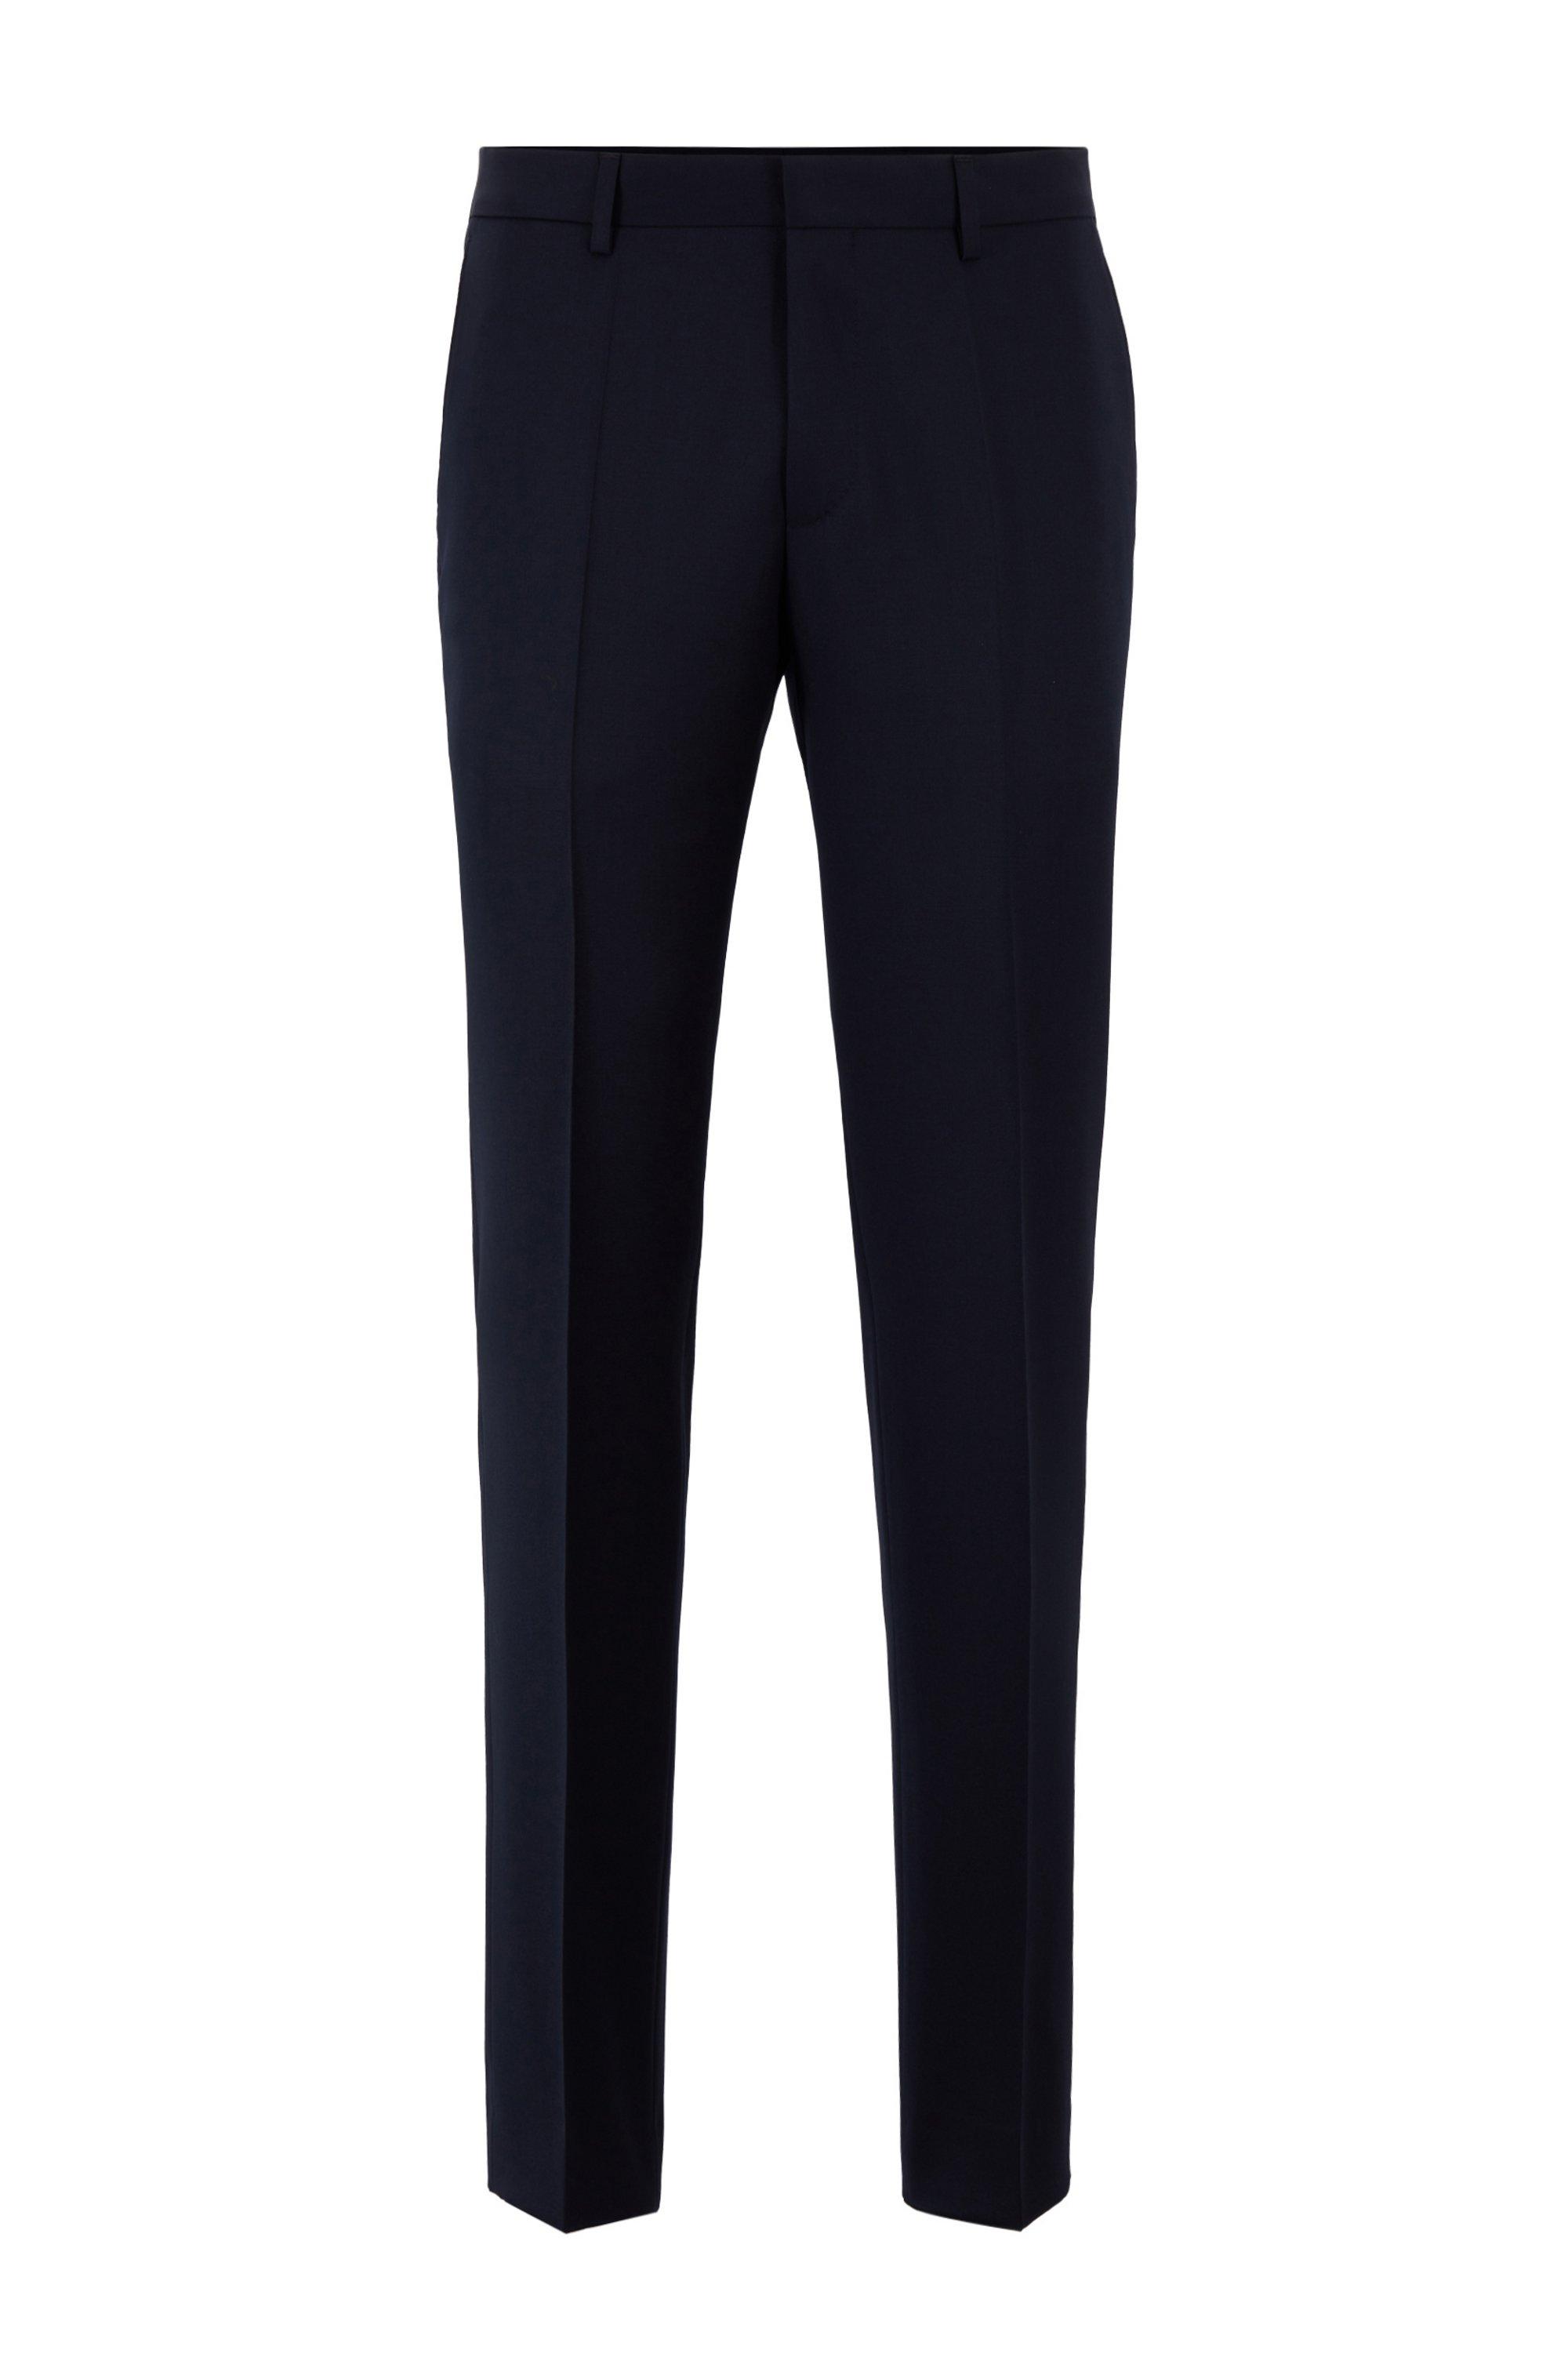 Pantalones slim fit en sarga de lana virgen jaspeada, Azul oscuro